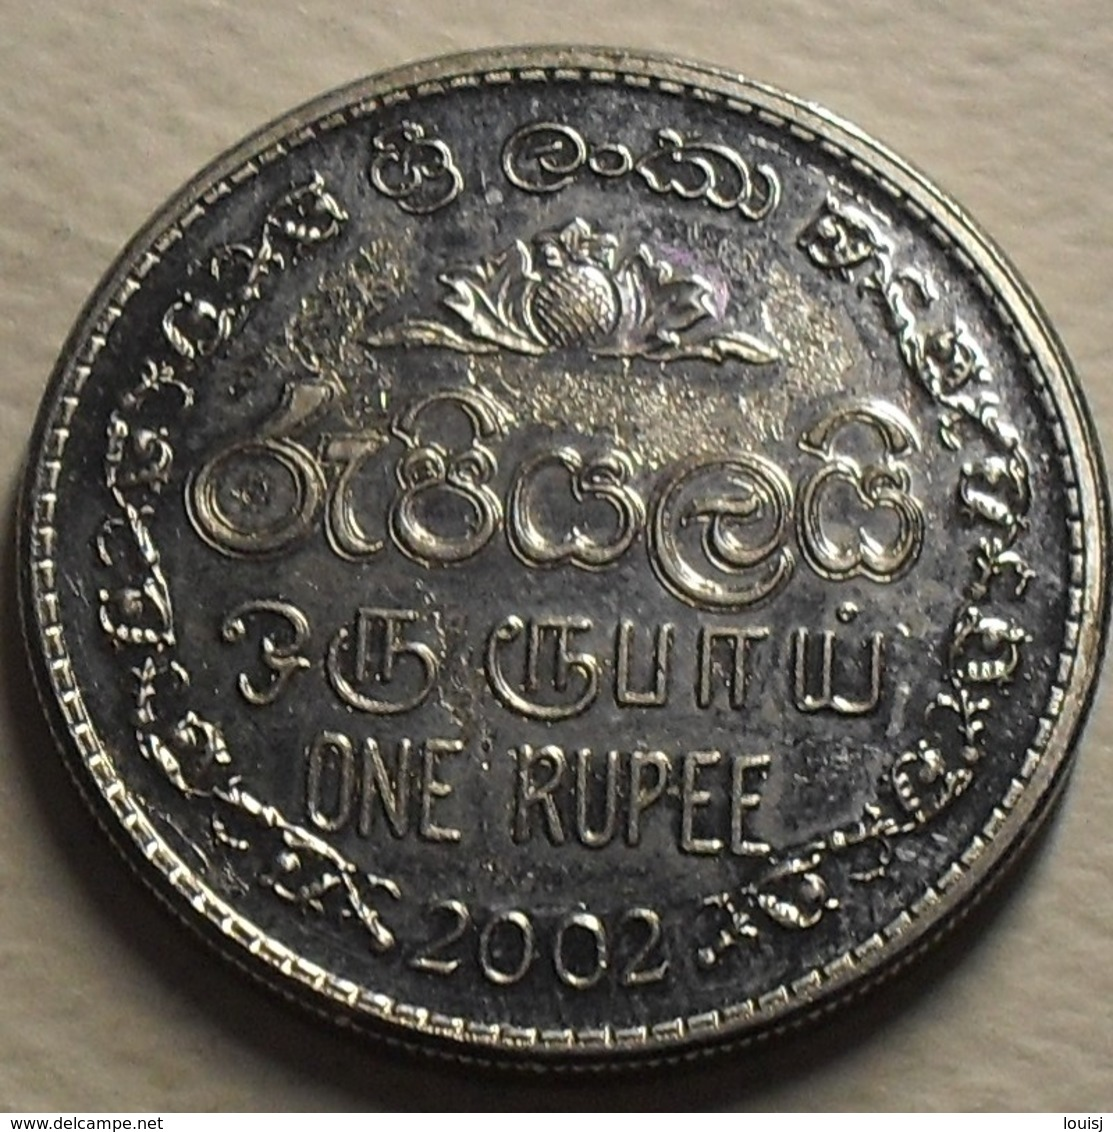 2002 - Sri Lanka - ONE RUPEE, Magnetic Coin, KM 136a - Sri Lanka